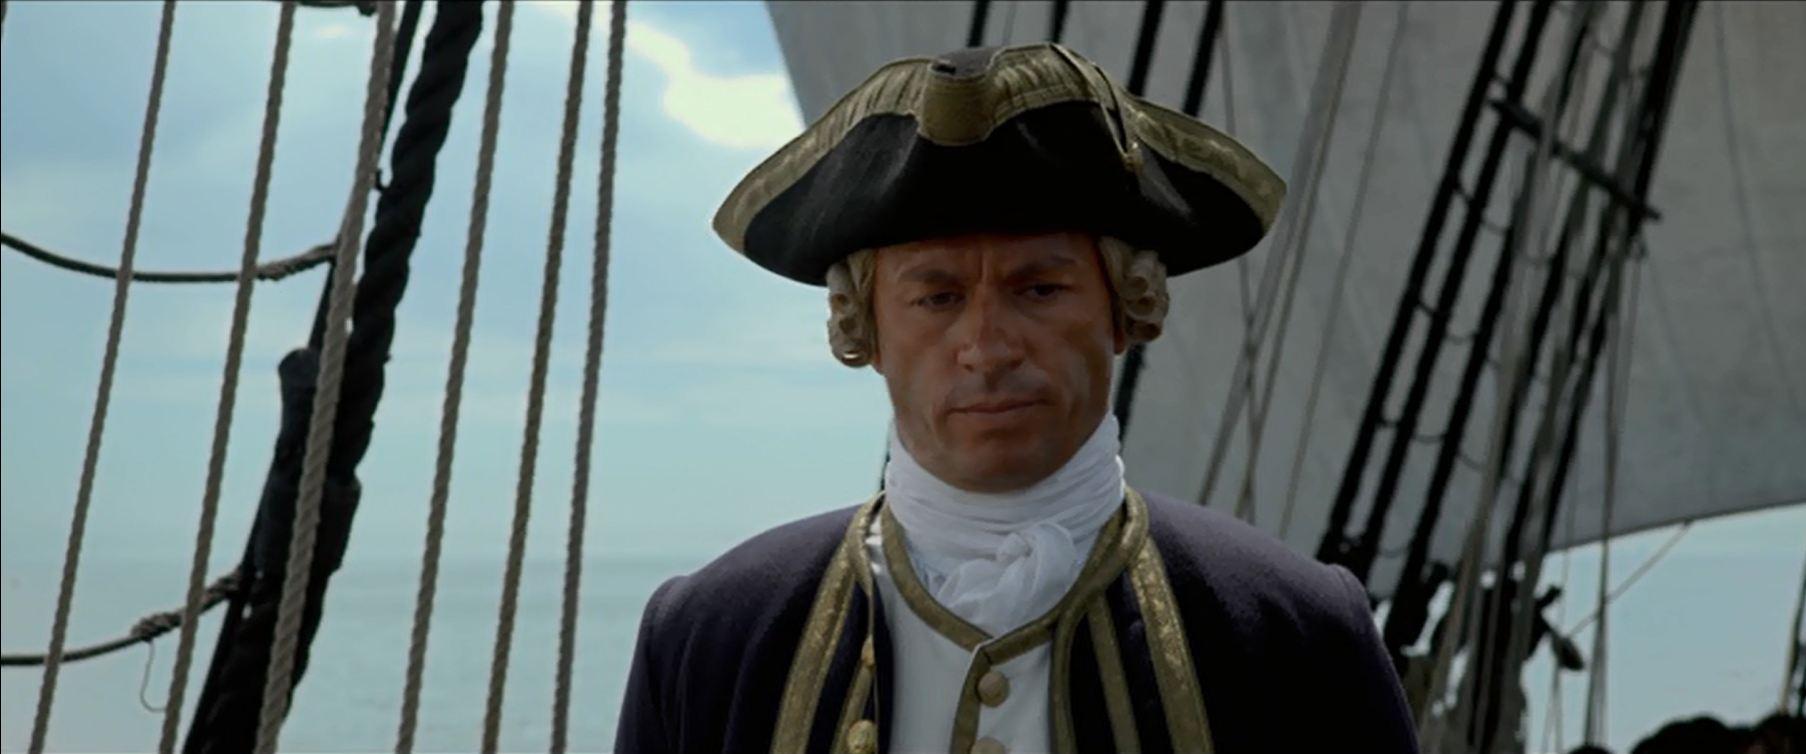 Джонни Депп заслуживает камео в «Пиратах Карибского моря 6», по мнению звезды